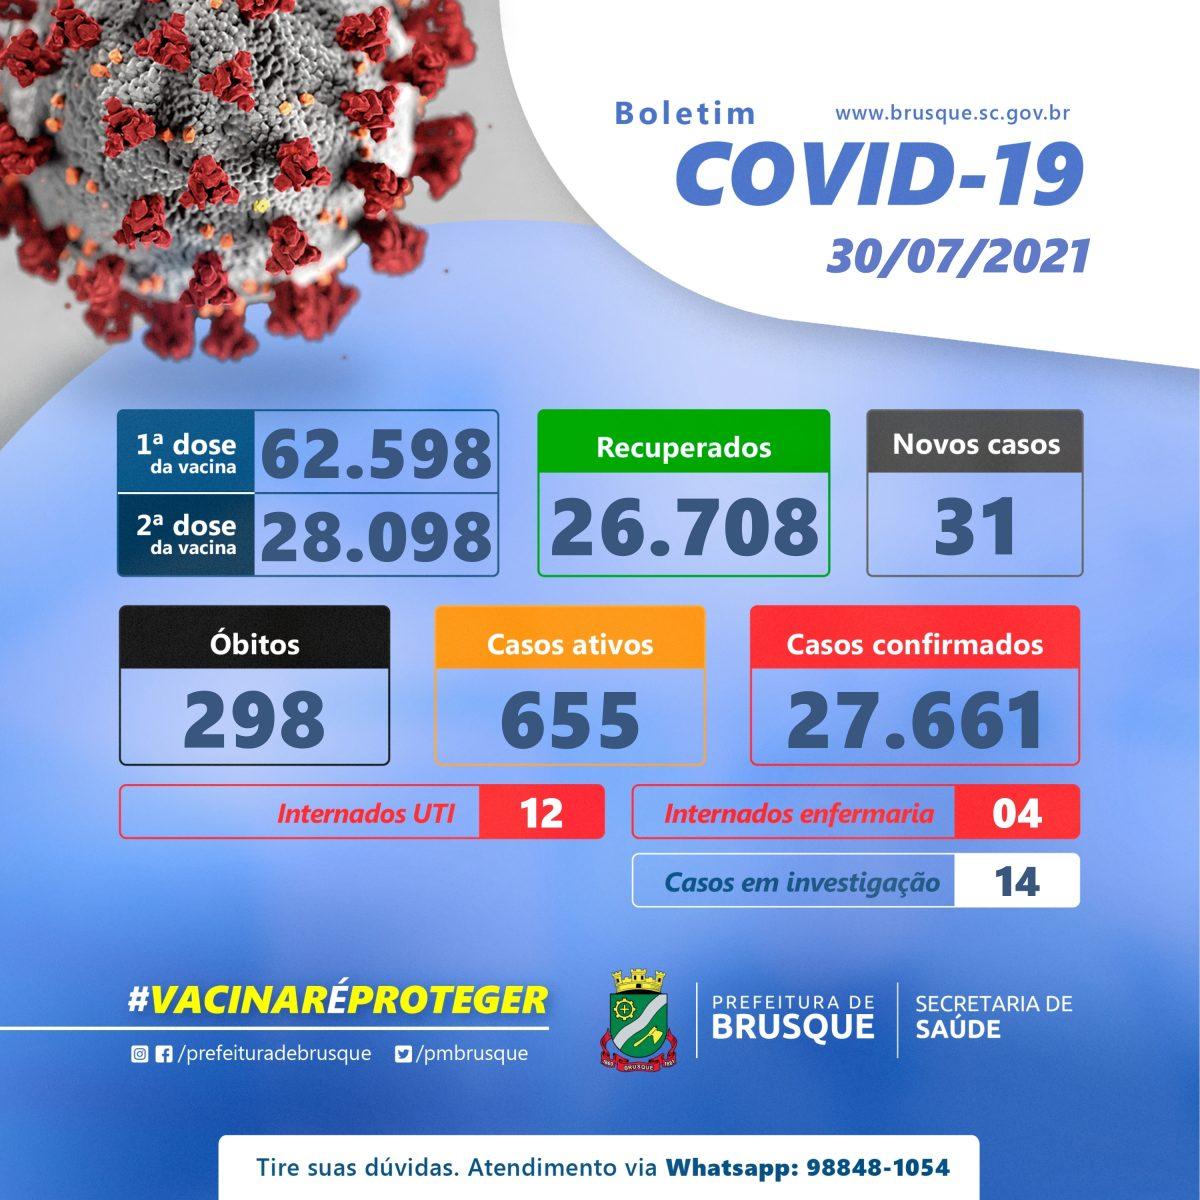 Covid-19: Confira o boletim epidemiológico desta sexta-feira (30)